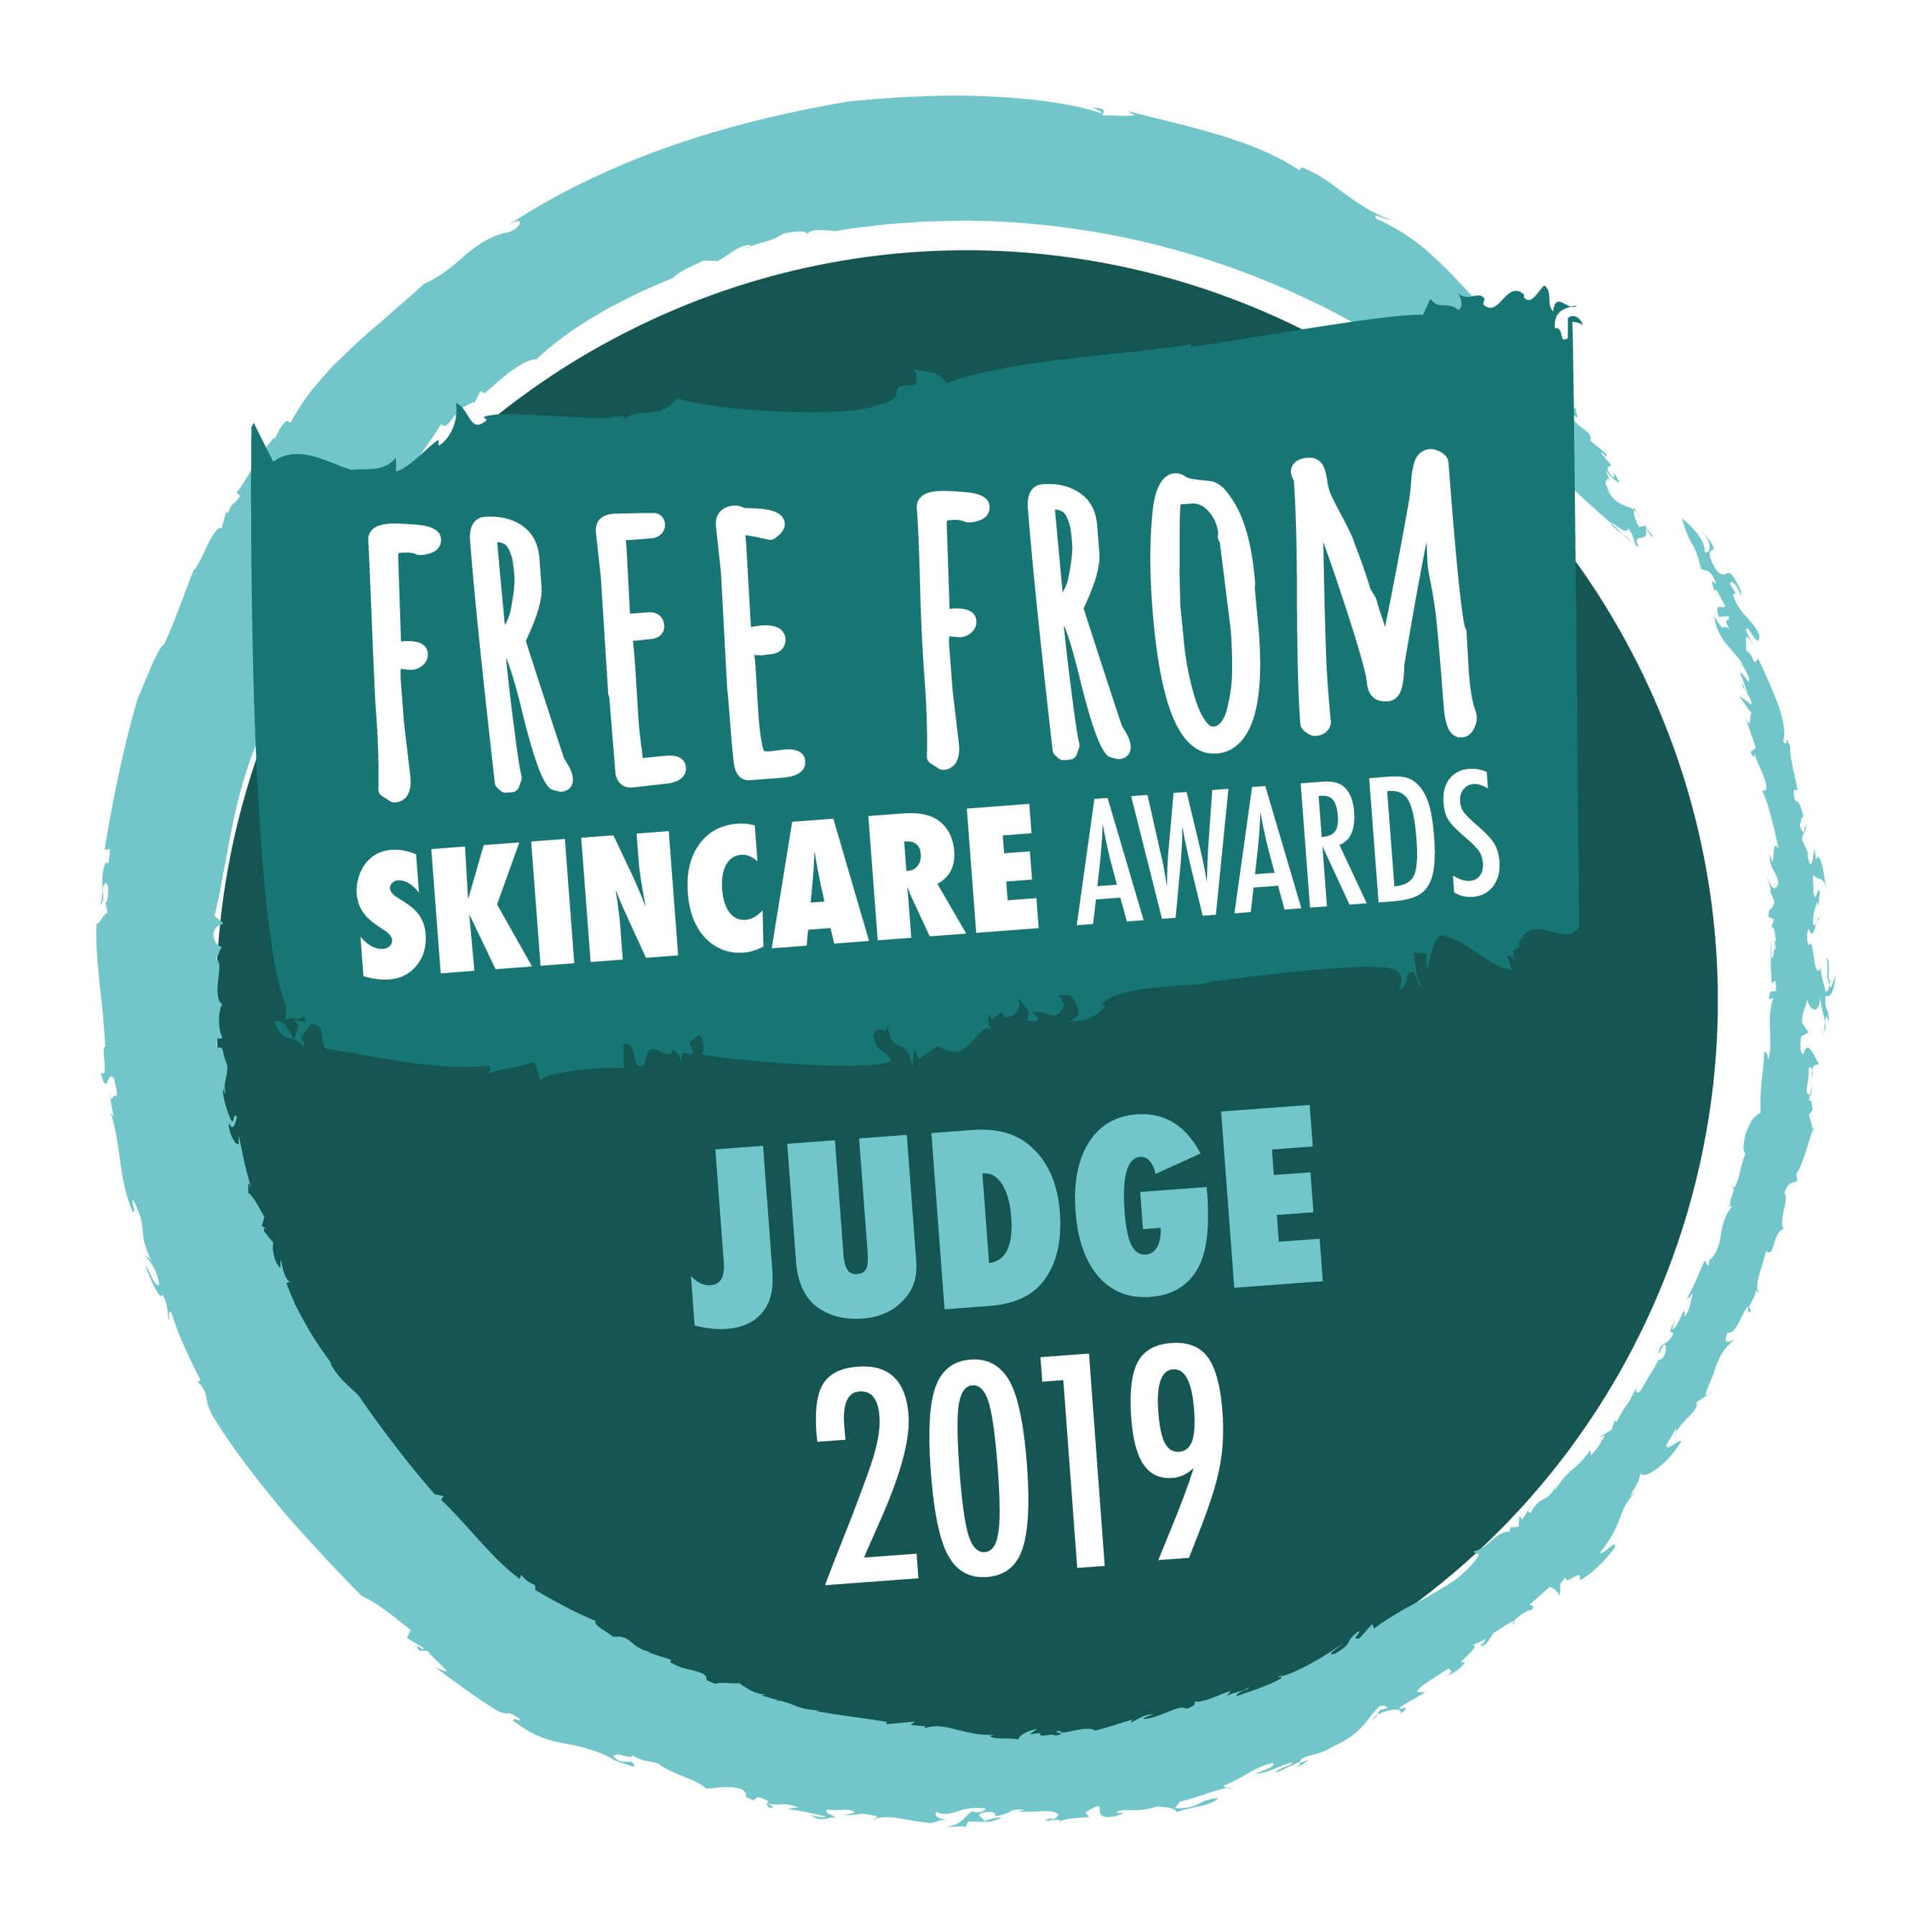 FreeFrom Skincare Awards 2019 judge